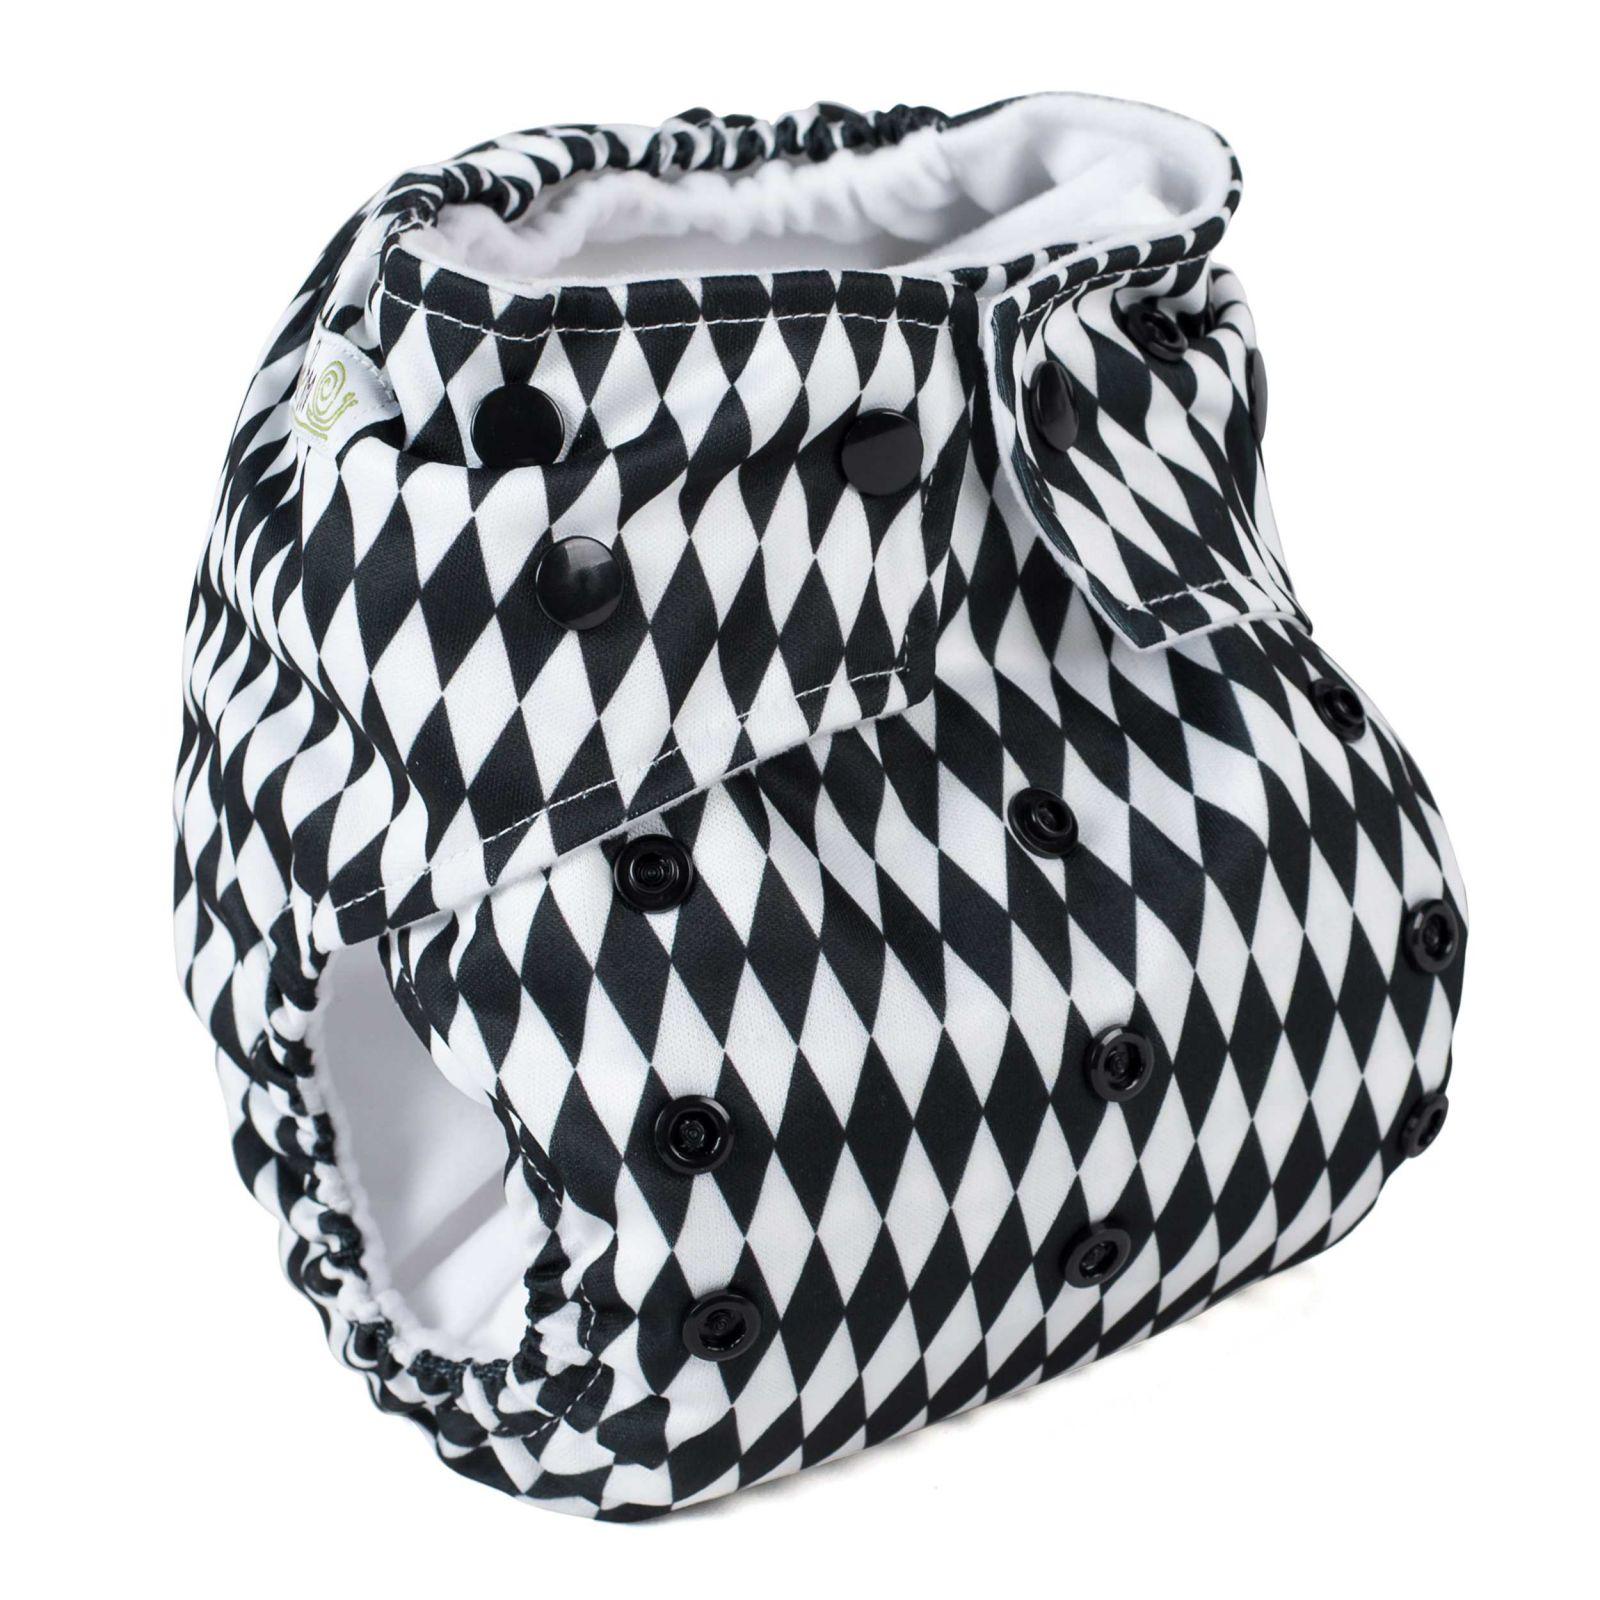 Baba+Boo plenkové kalhotky V2, Design Harlequin